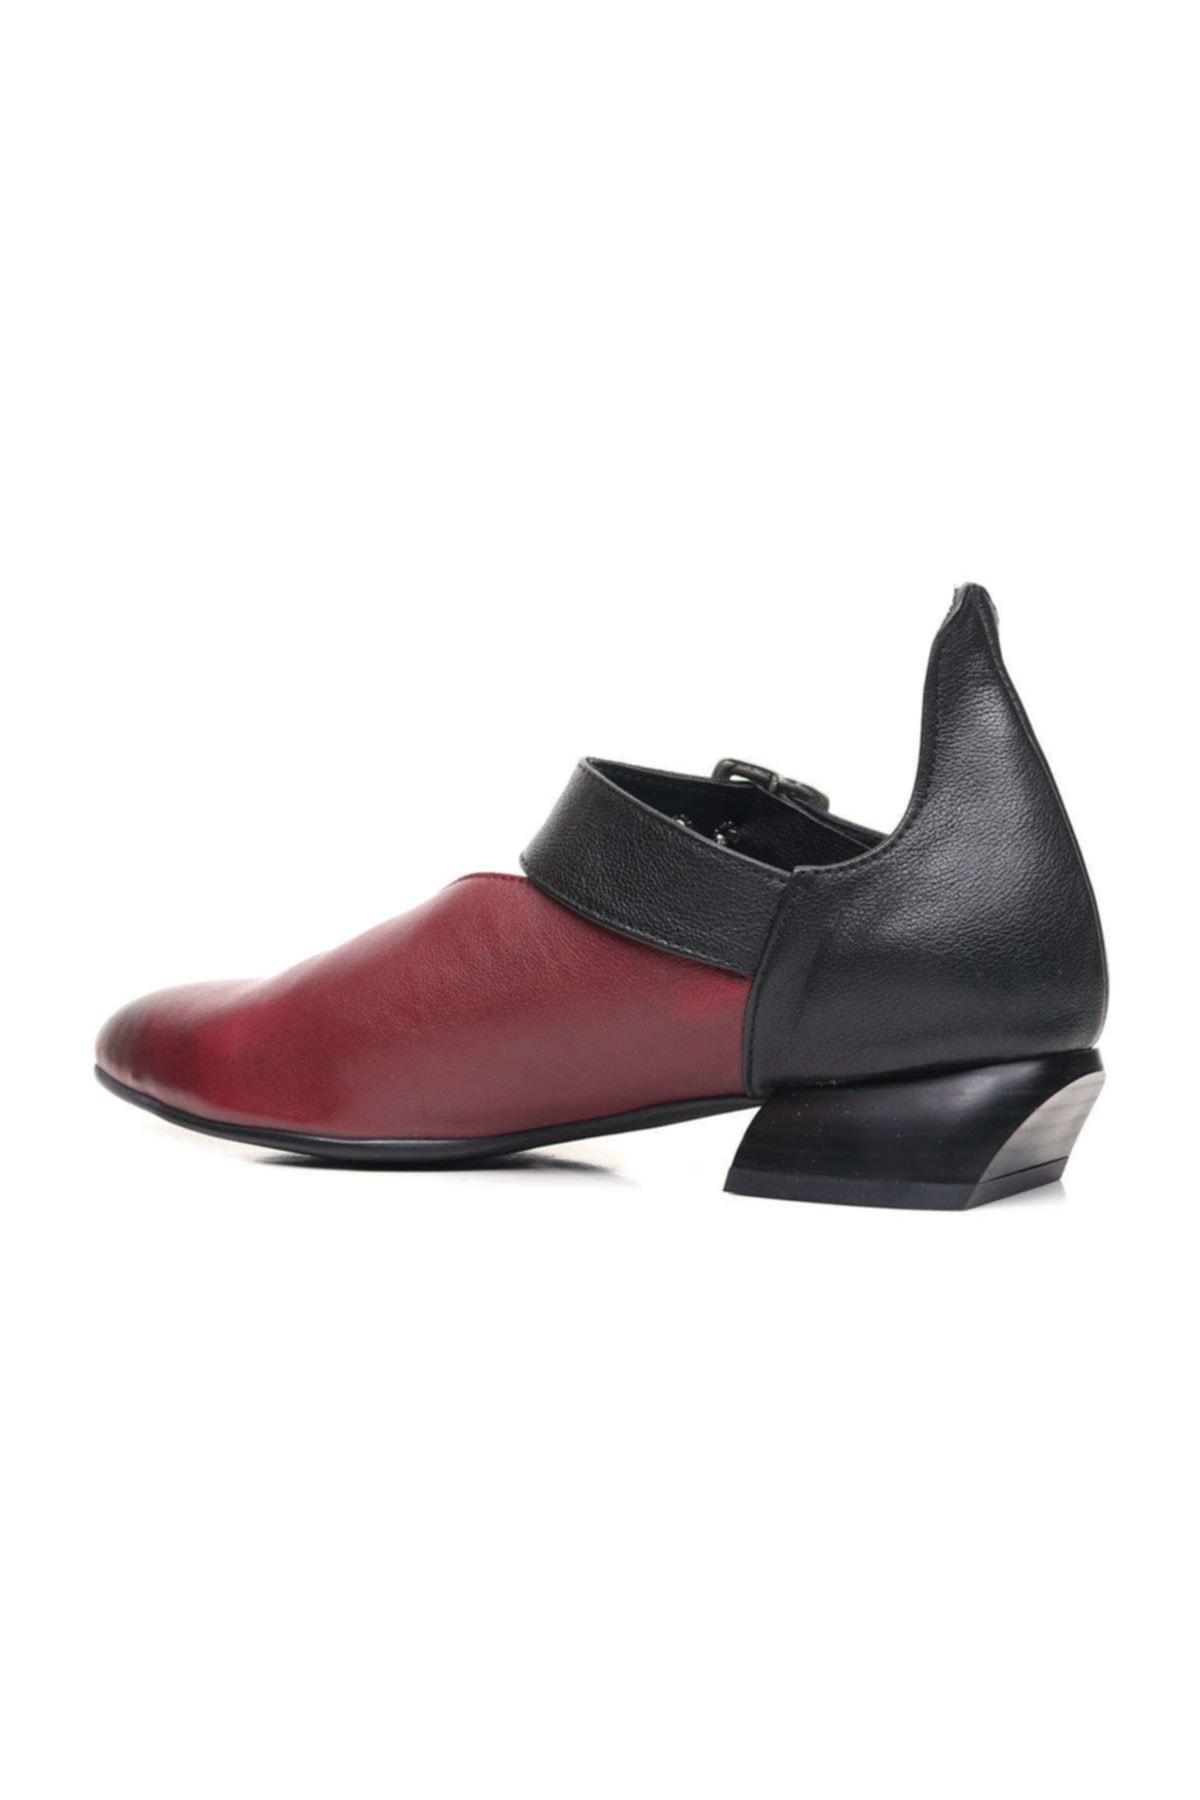 BUENO Shoes  Kadın Ayakkabı 9p5500 2